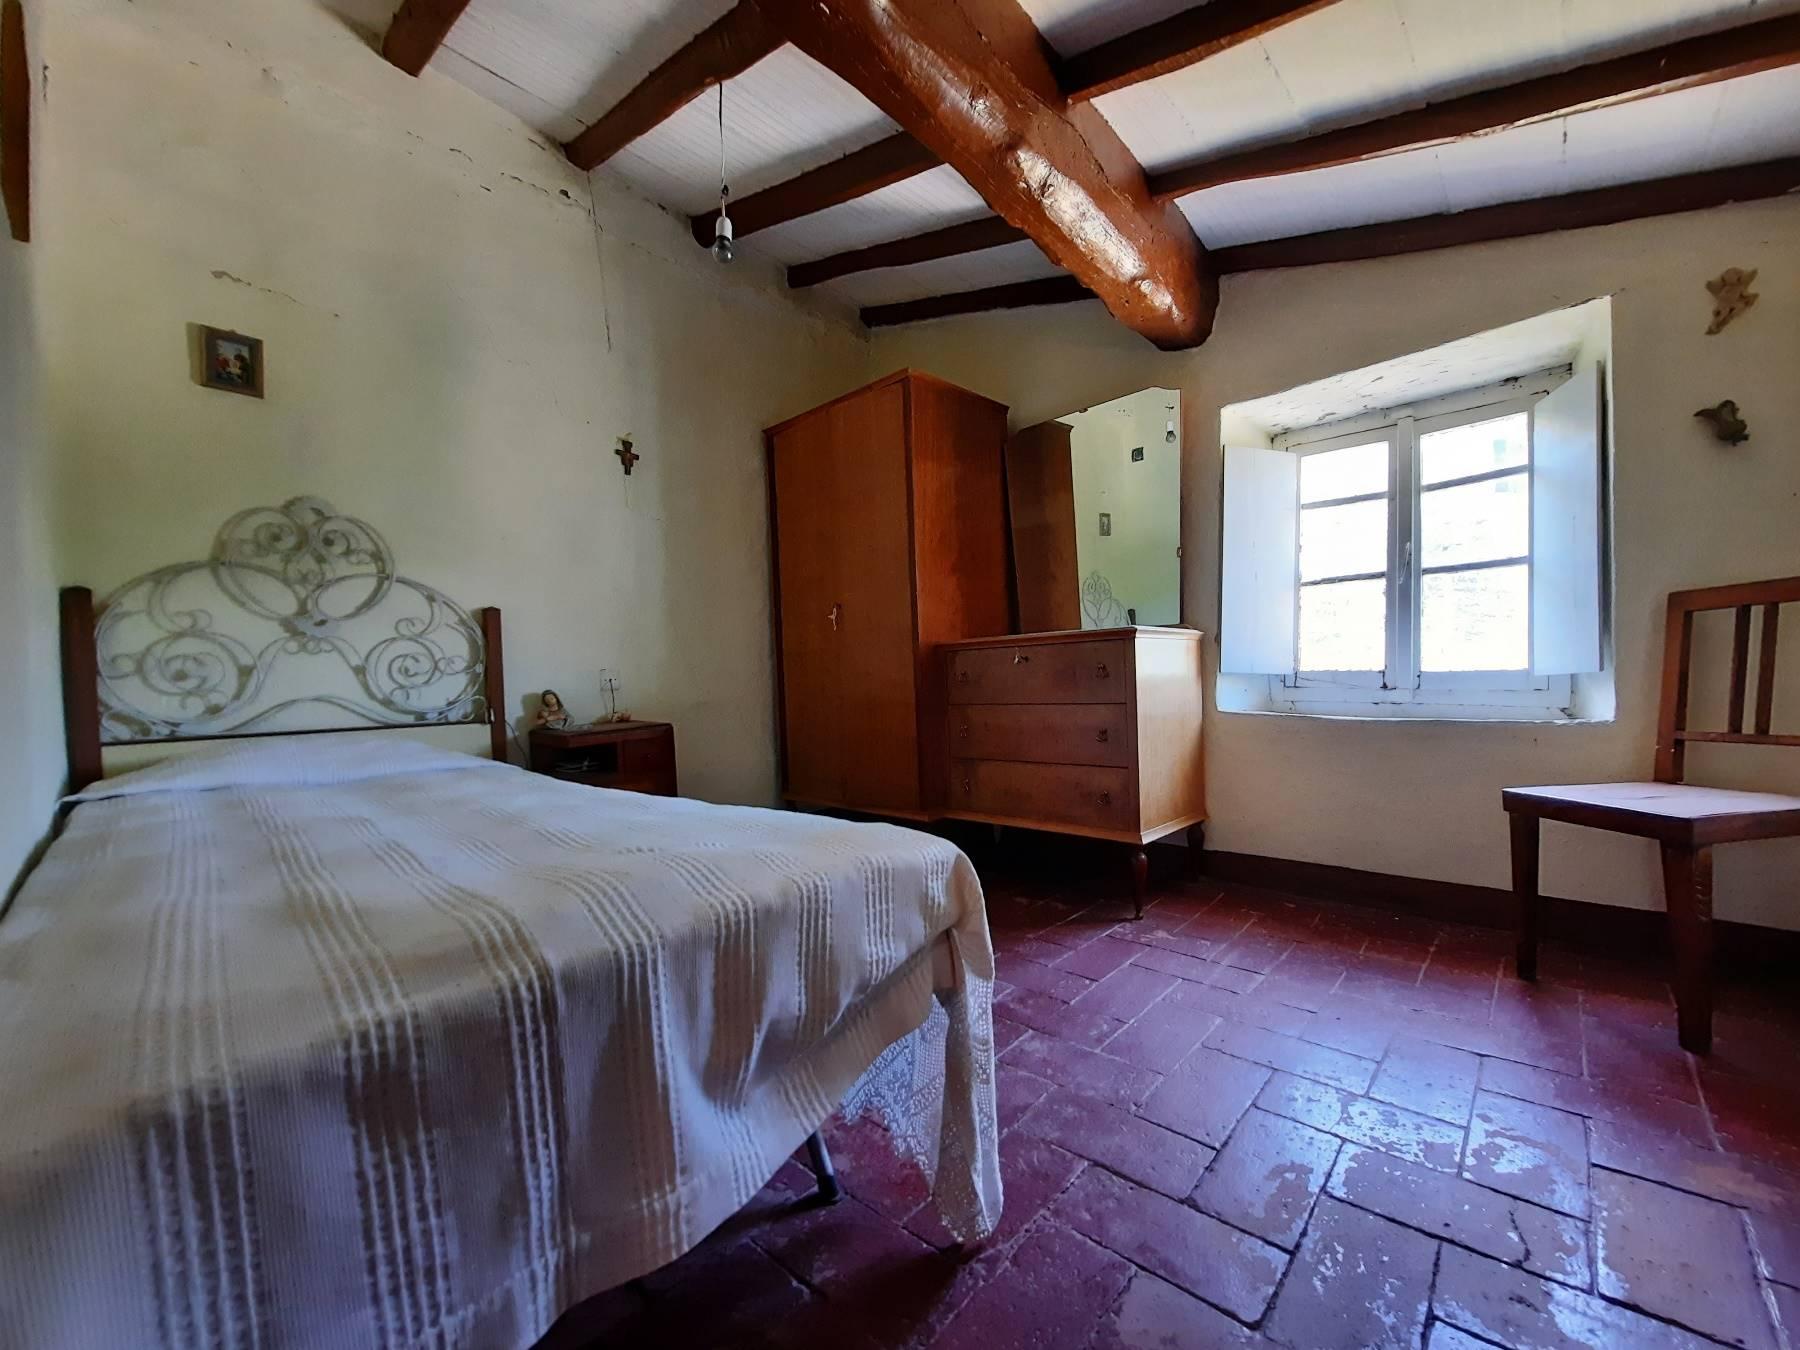 La camera 4 - The bedroom 4